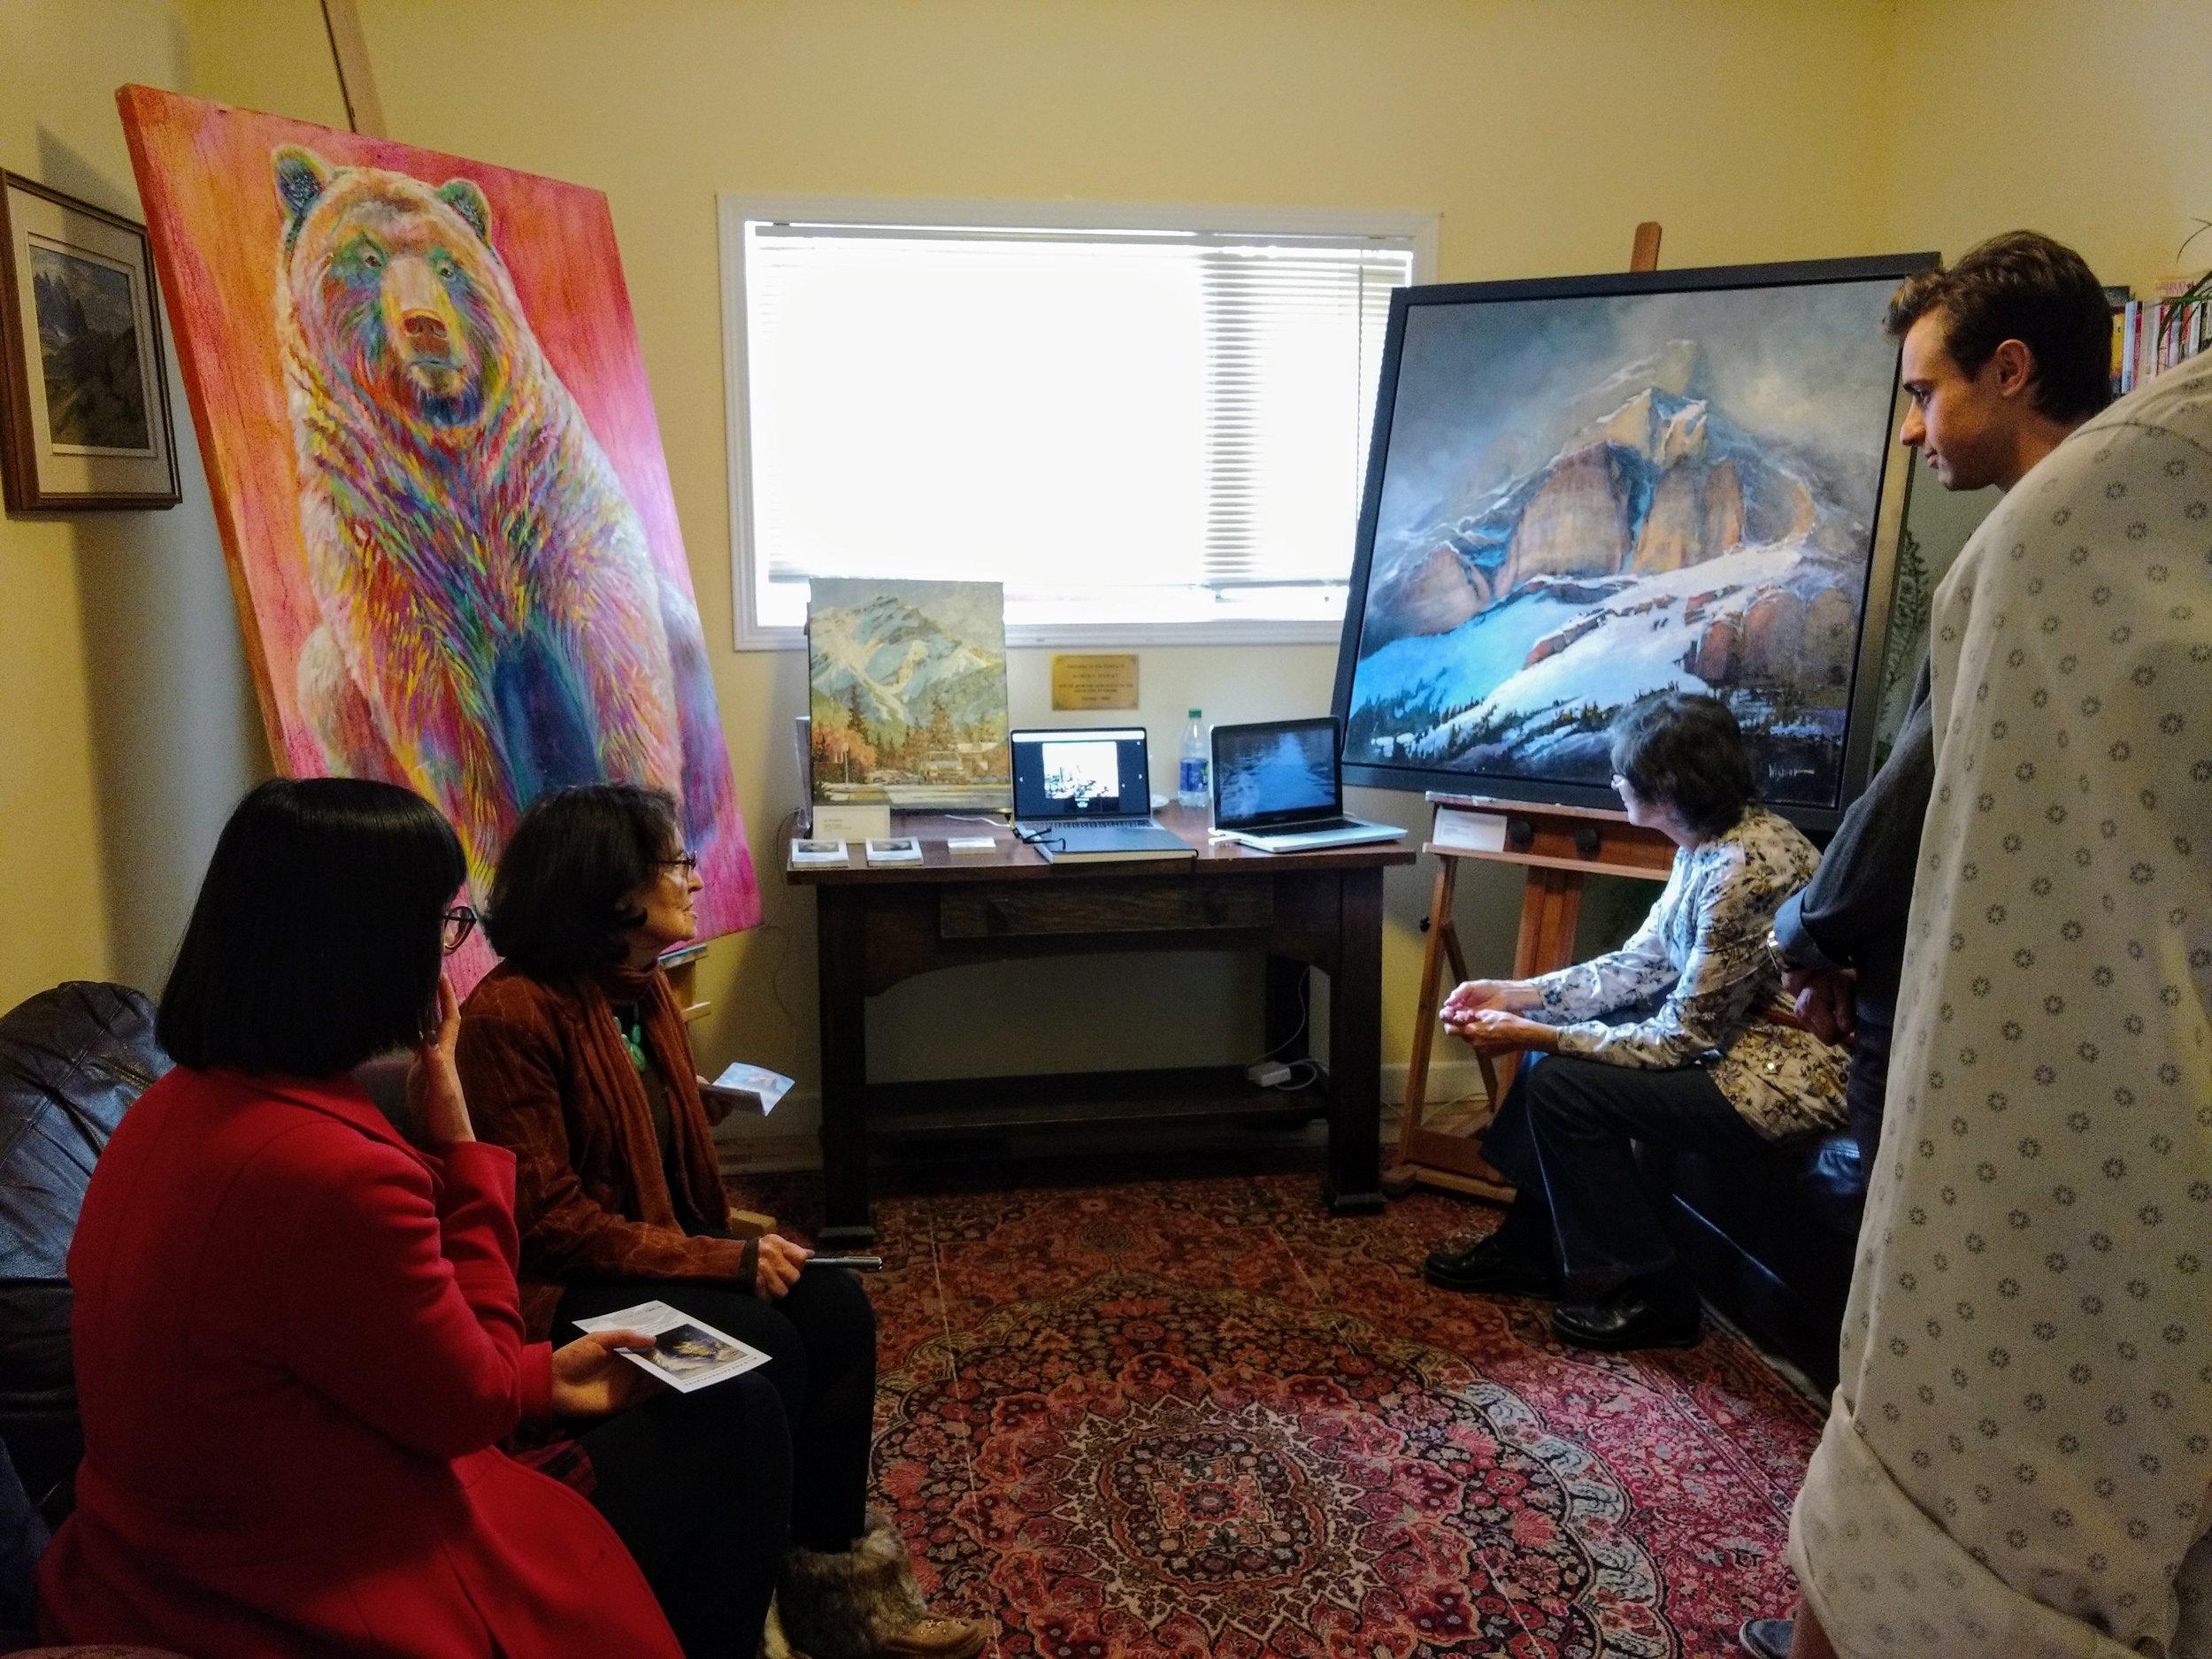 Mountain Galleries exhibiting their artists' work.